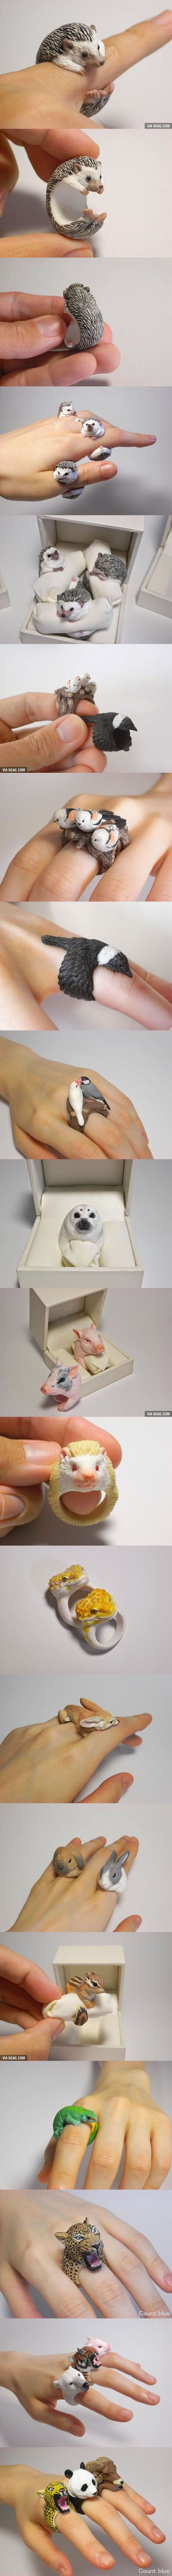 Very Realistic Animal Rings By Jiro Miura :D I want!!!!